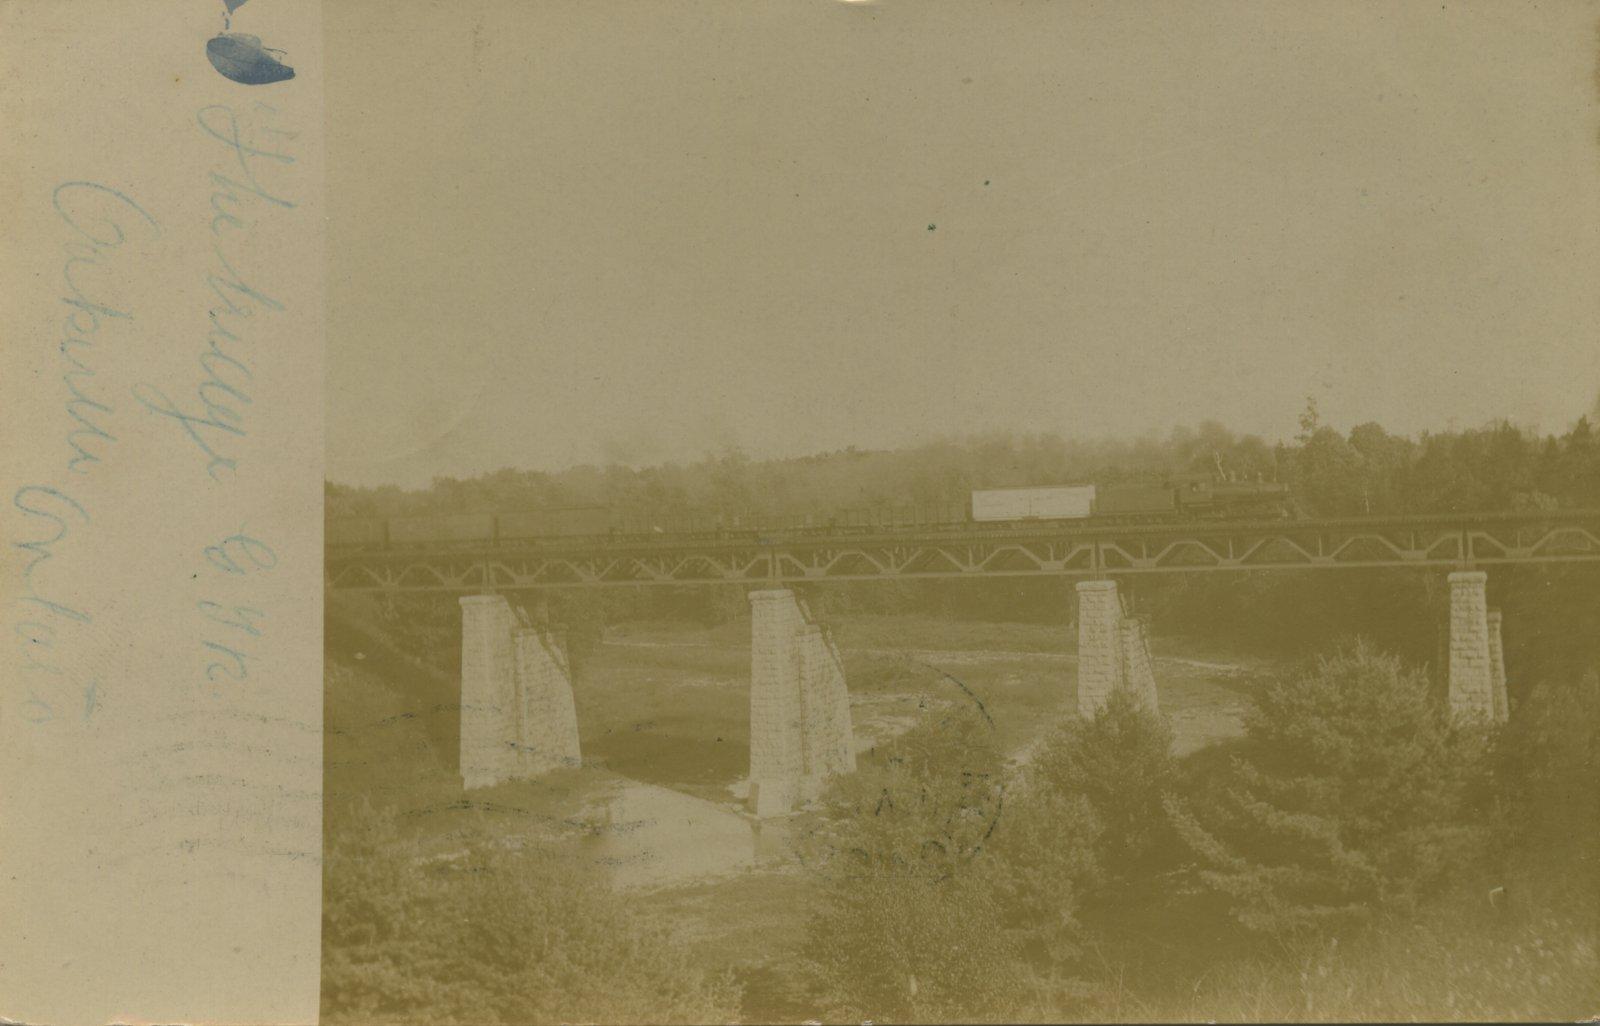 The bridge, Grand Trunk Railway, Oakville, Ont.